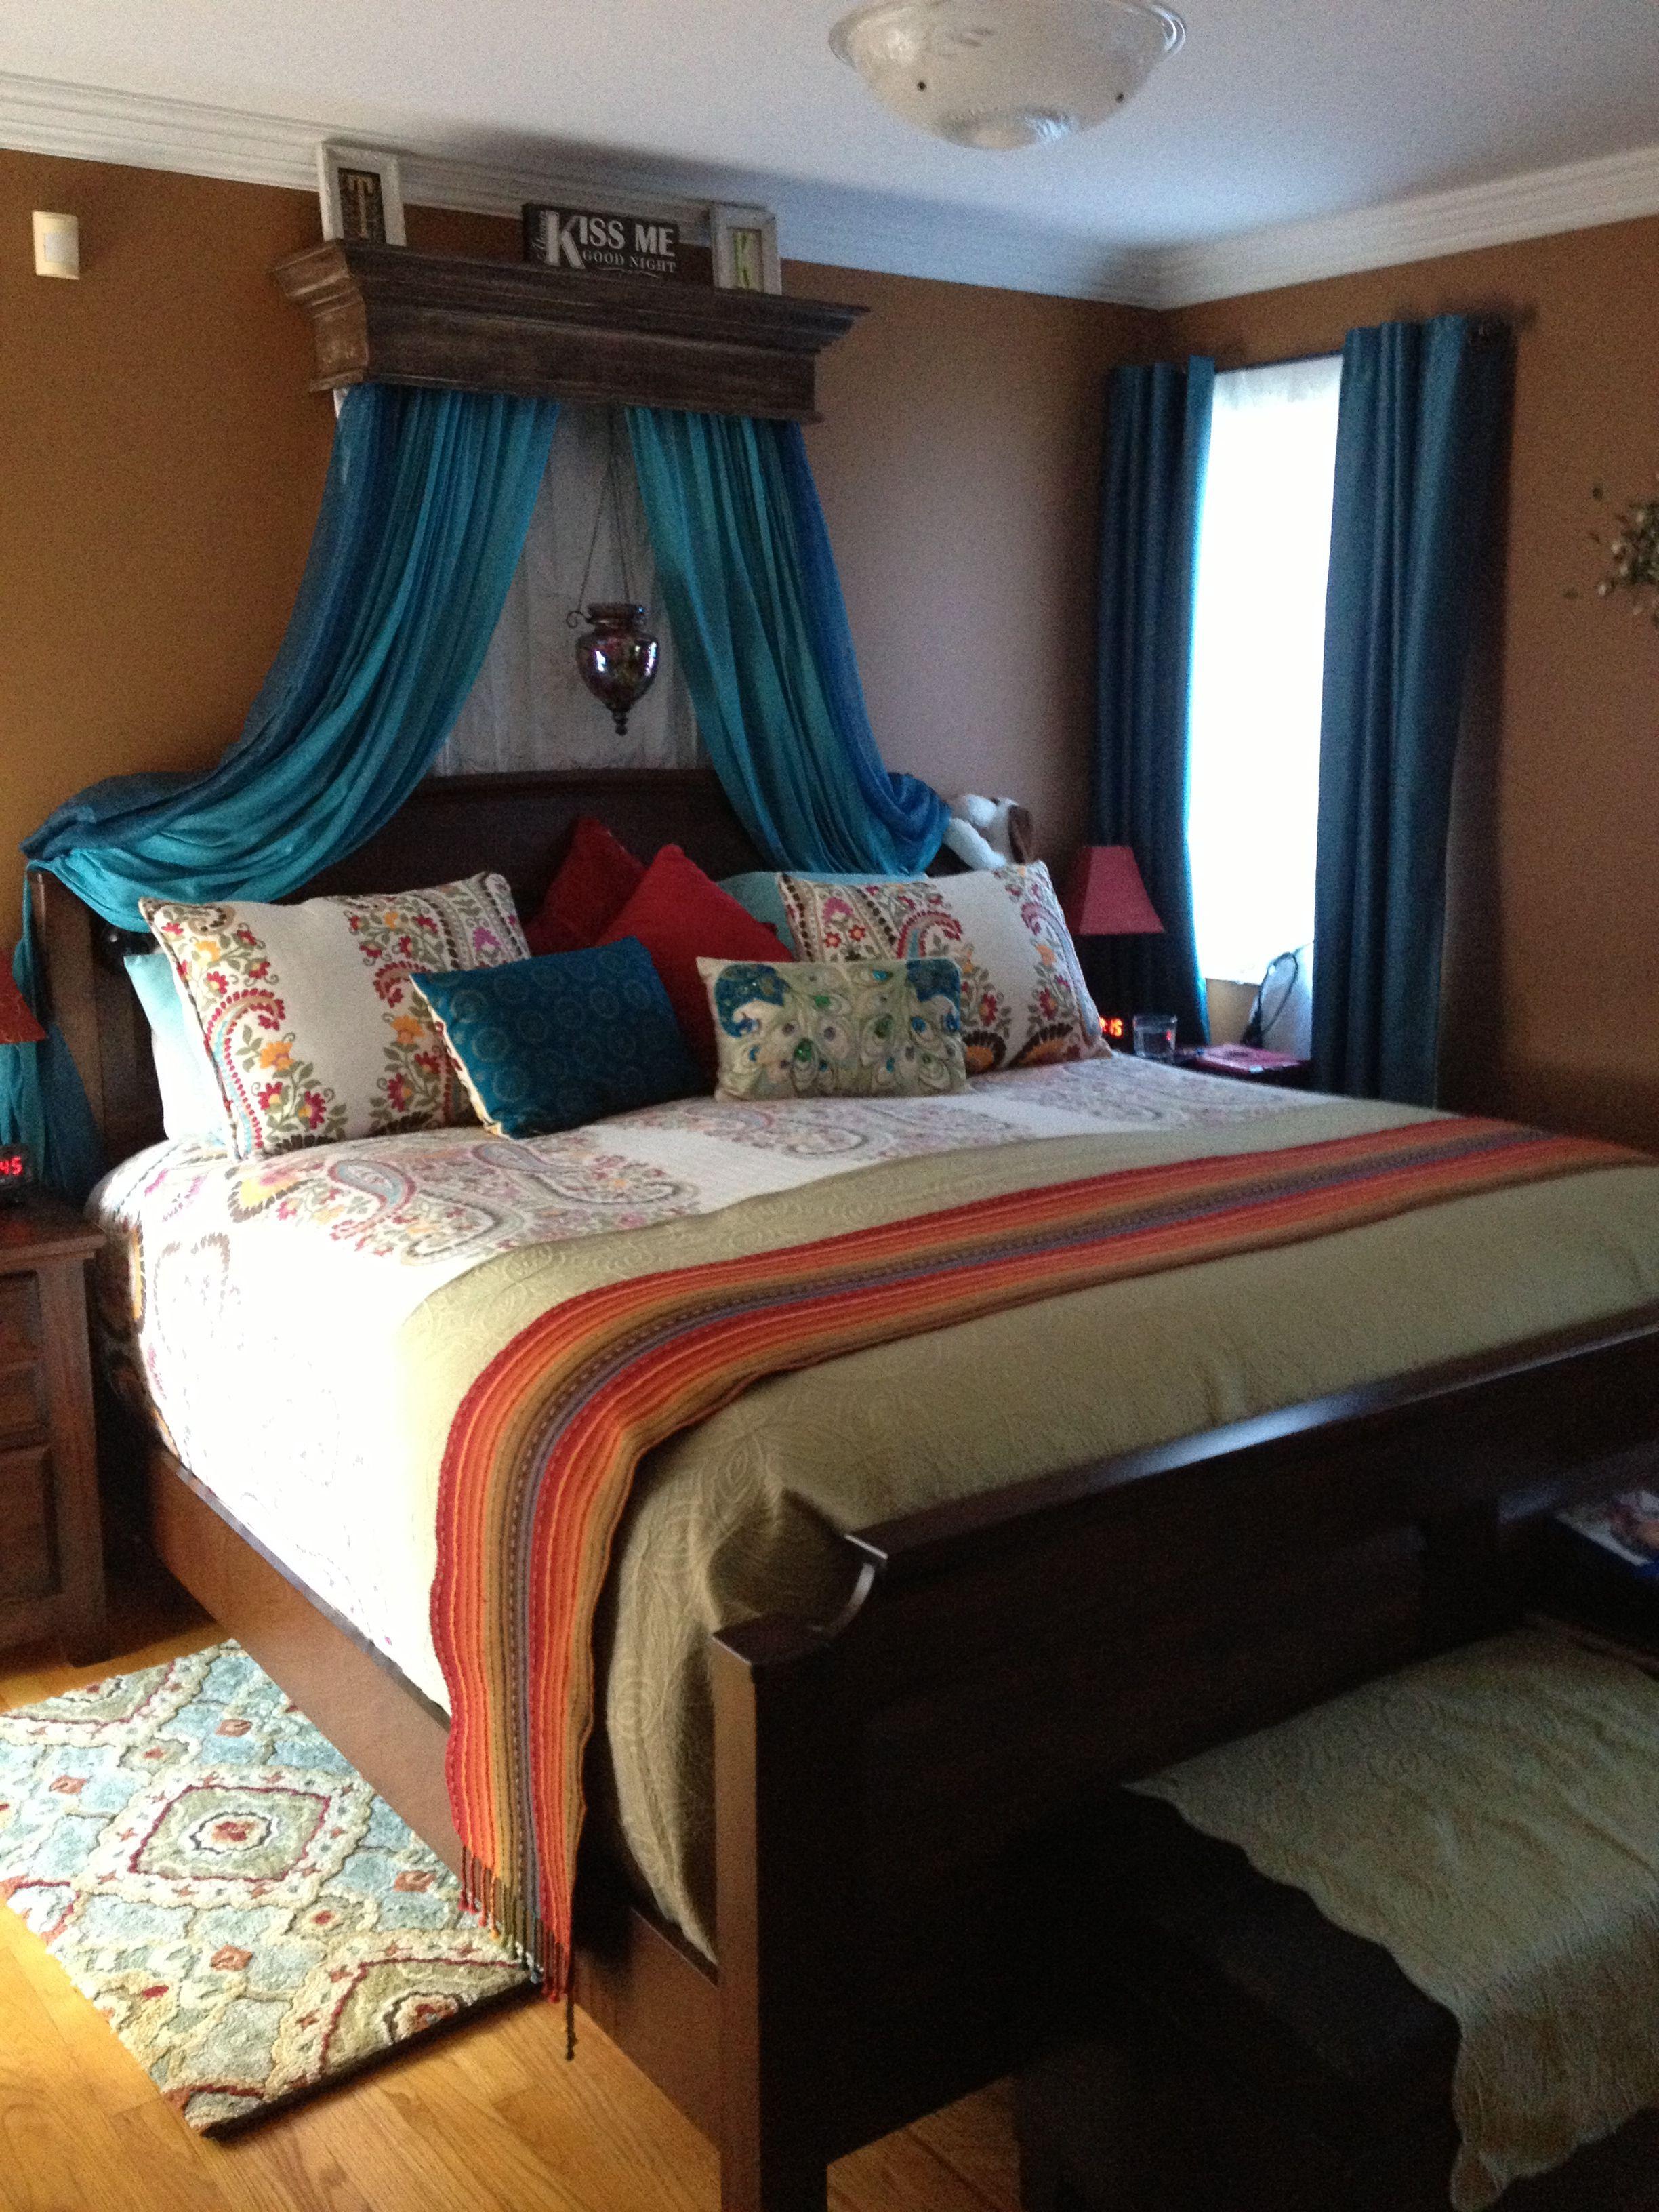 My bedroom.pier one lantern with led tea lights inside